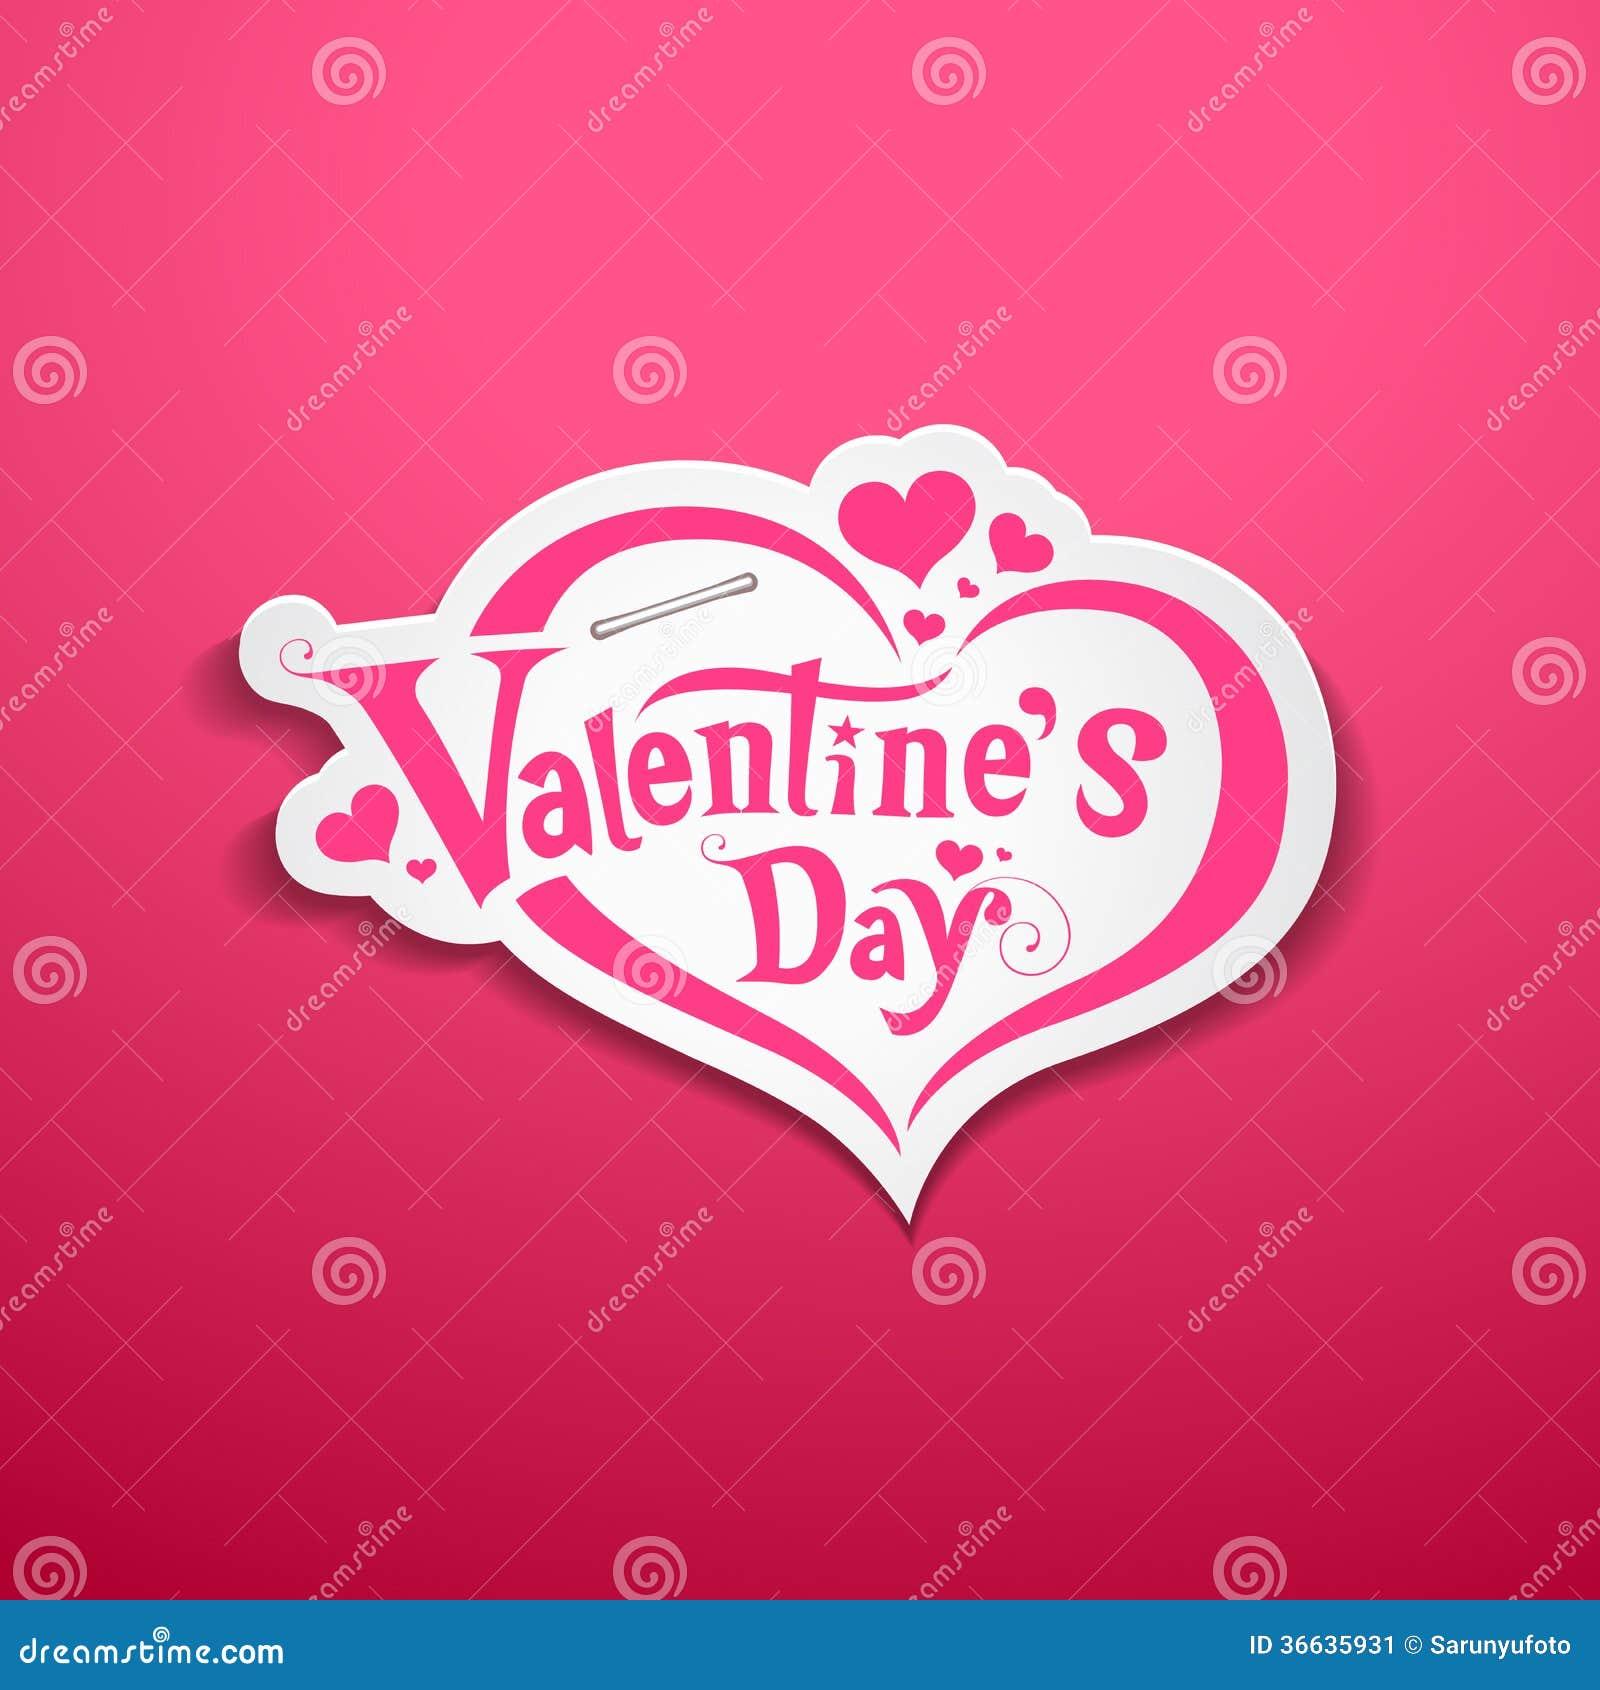 Happy Valentines Day Lettering Design Stock Illustration